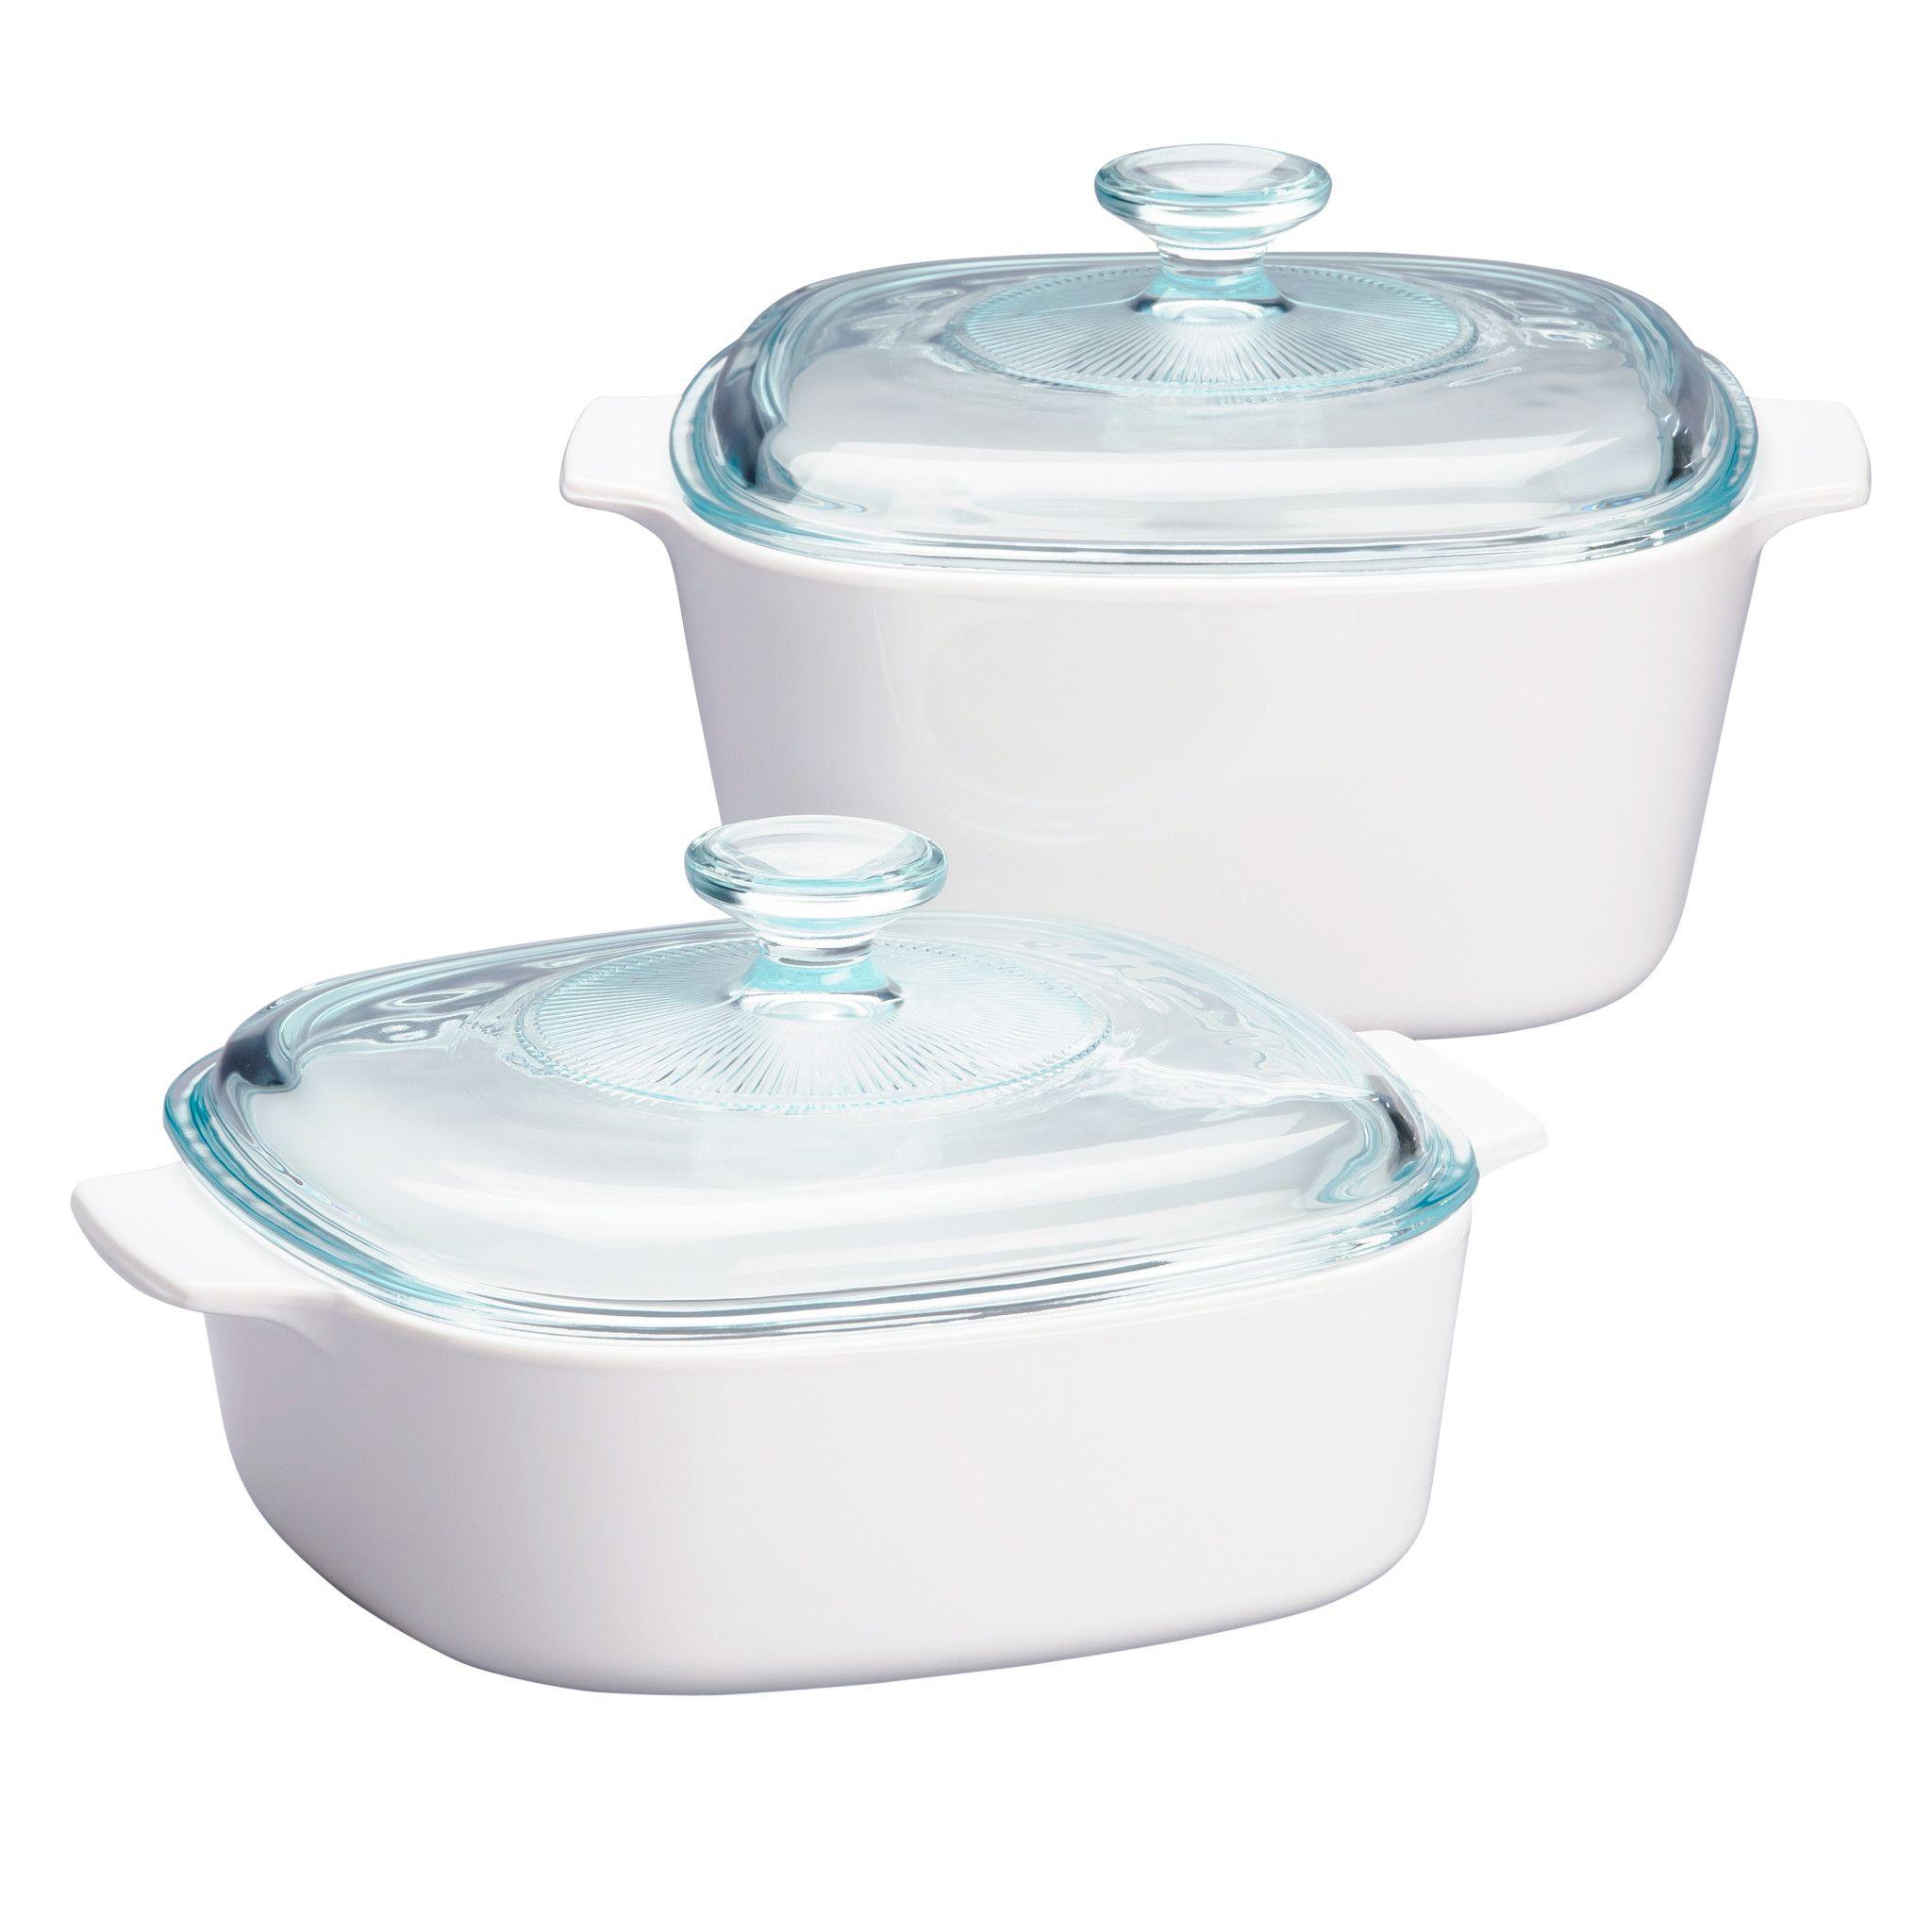 Stovetop Pyroceram Just White 4 Pc Casserole Set Corningware